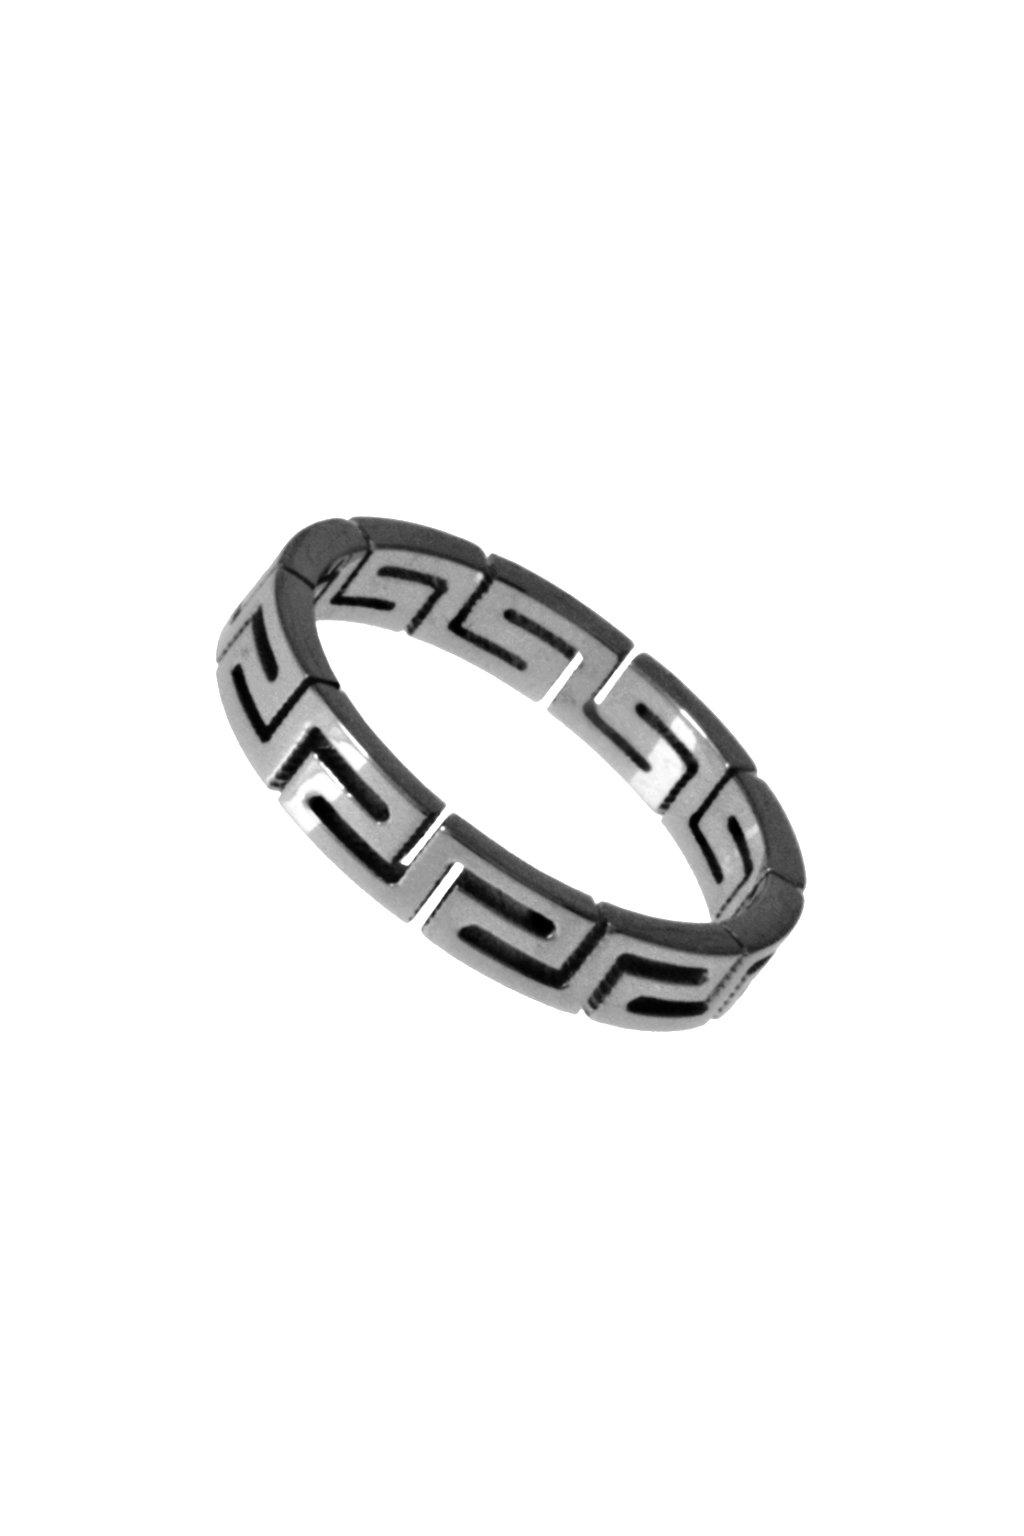 Skalimar Prsten z chirurgické oceli S ŘECKÝM VZOREM 312647